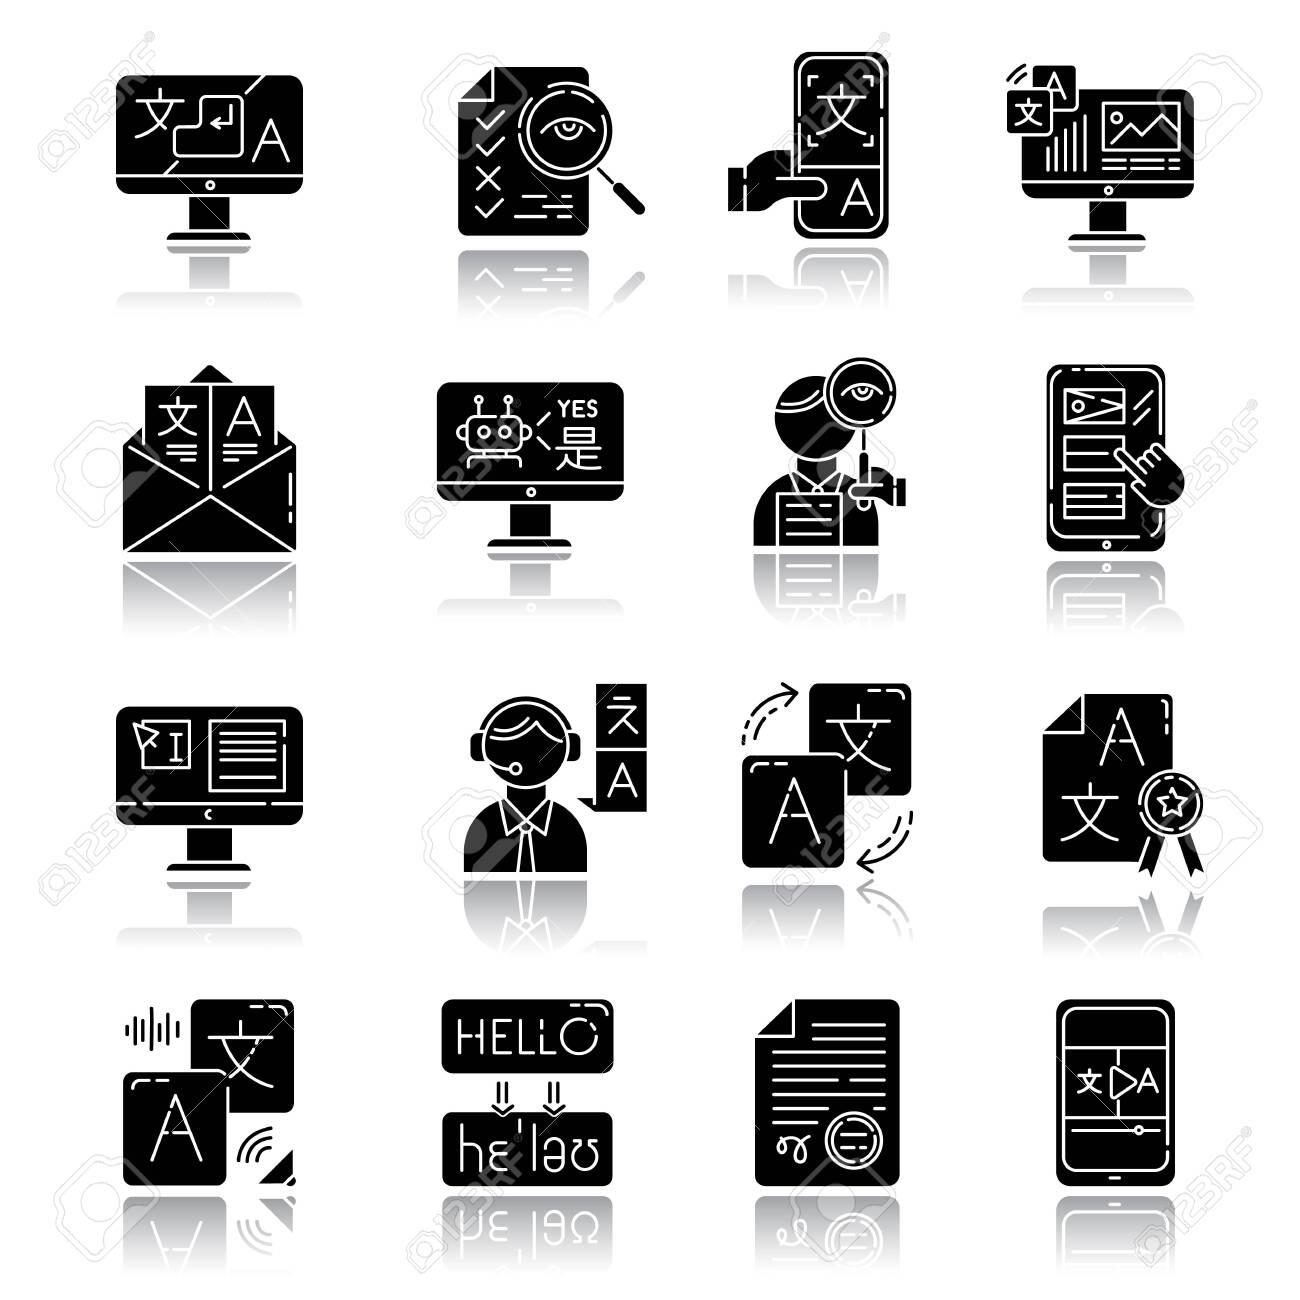 Language translation service drop shadow black glyph icons set. Instant translation. Audio, video interpretation. Multilingual app, chatbot. Transcription, proofreading. Isolated vector illustrations - 133528204